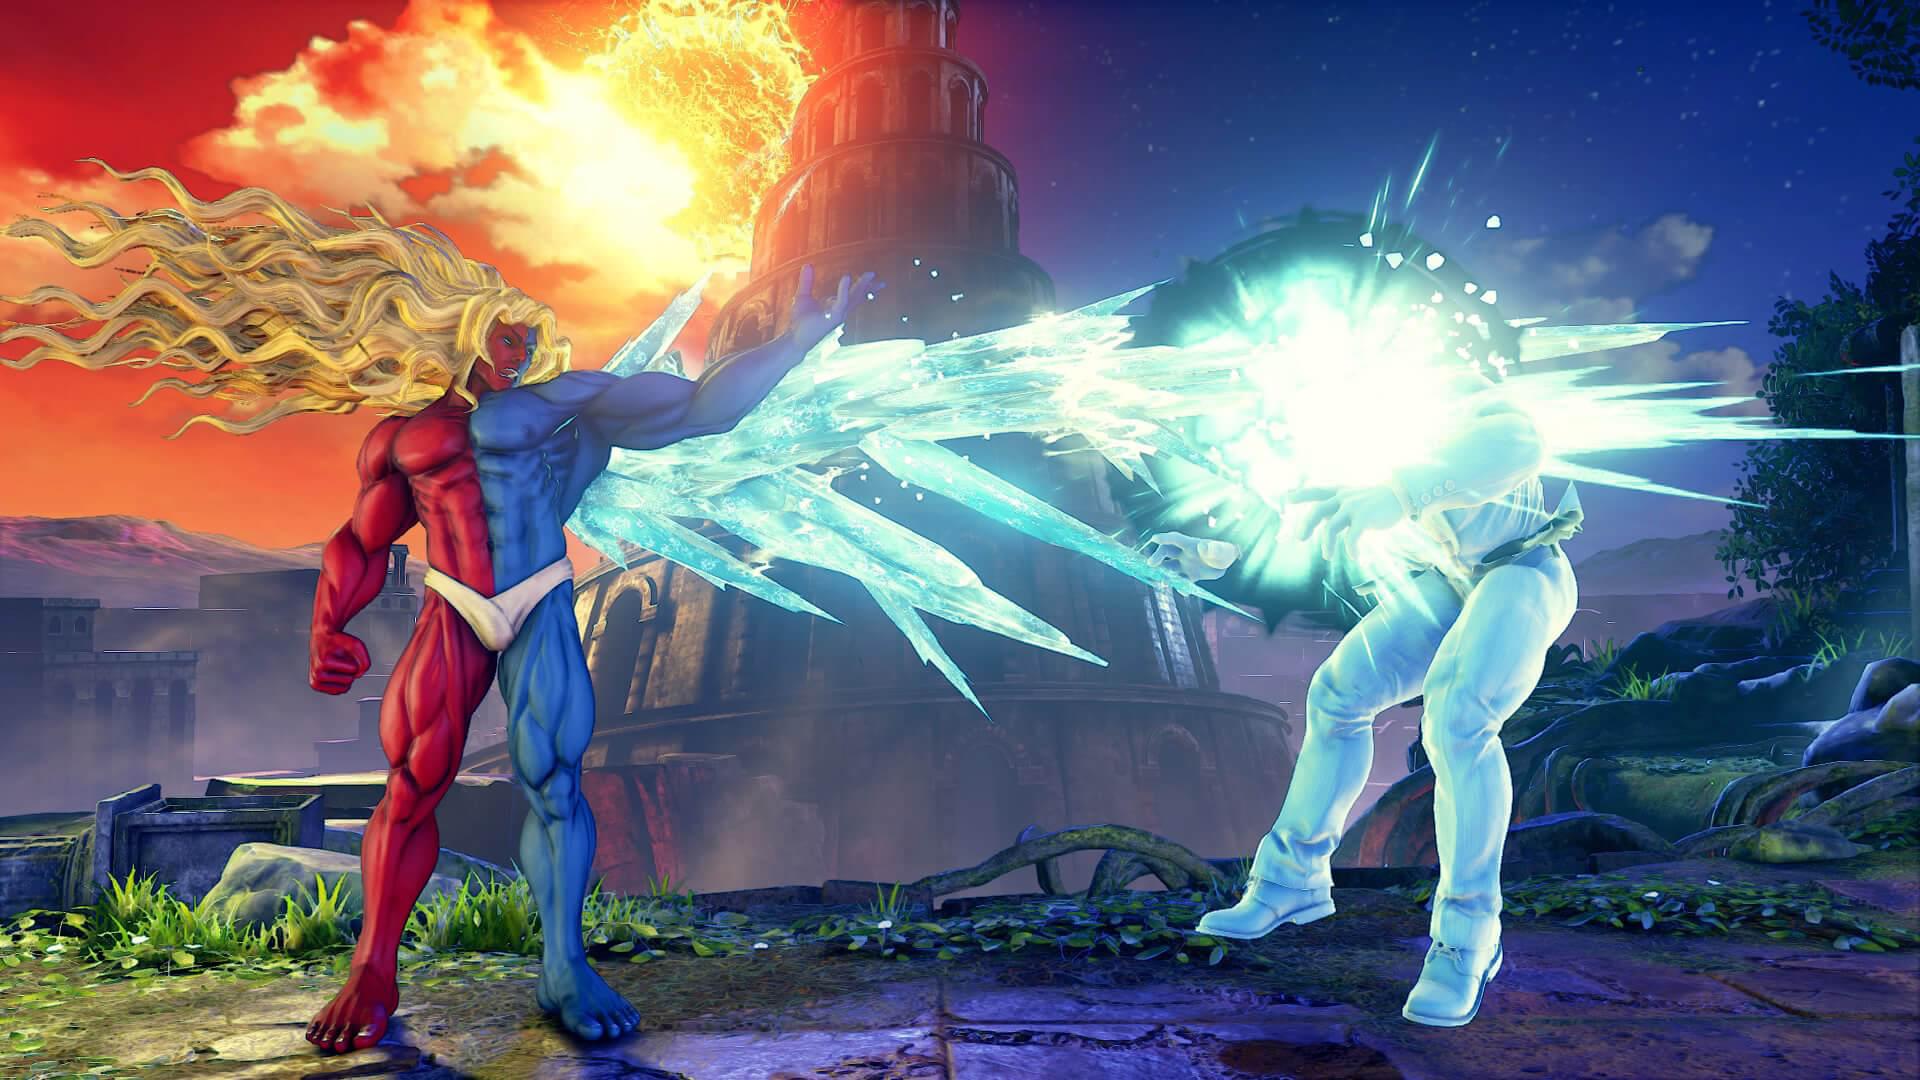 Street Fighter 5 Guide: Tips for beginners